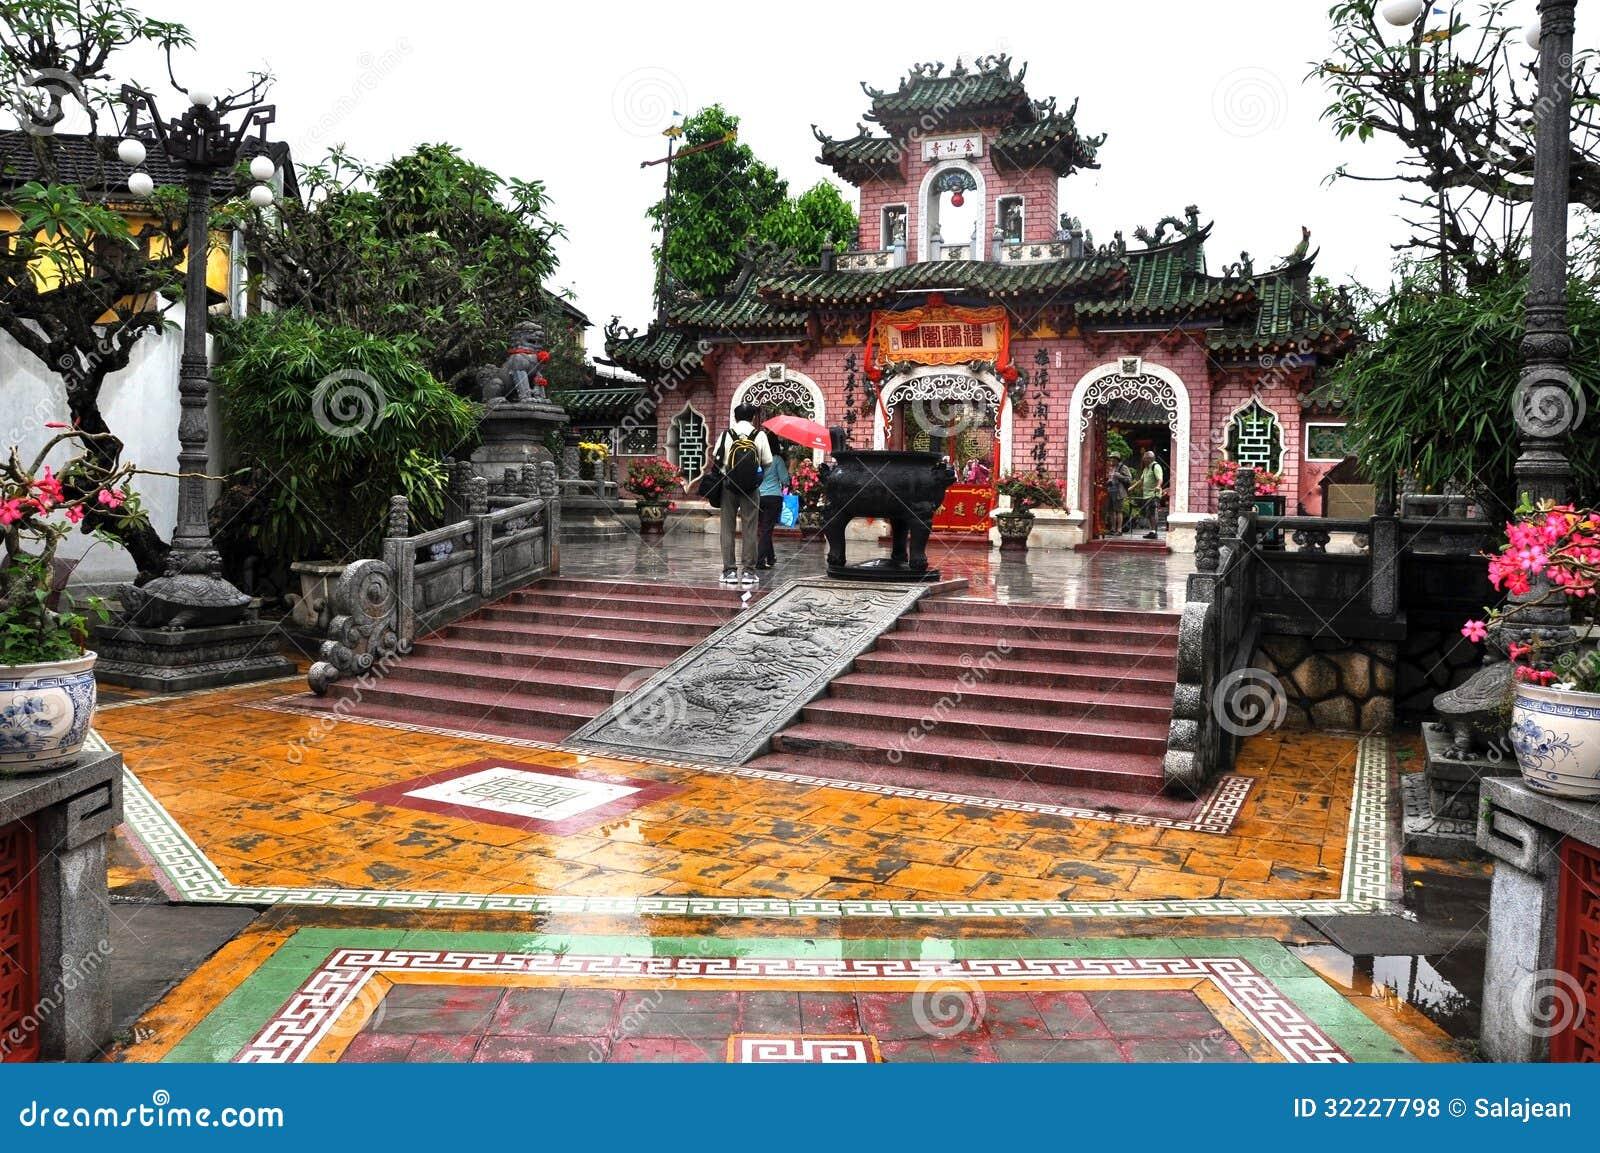 Chinese Montagehal, Hoi An, Vietnam